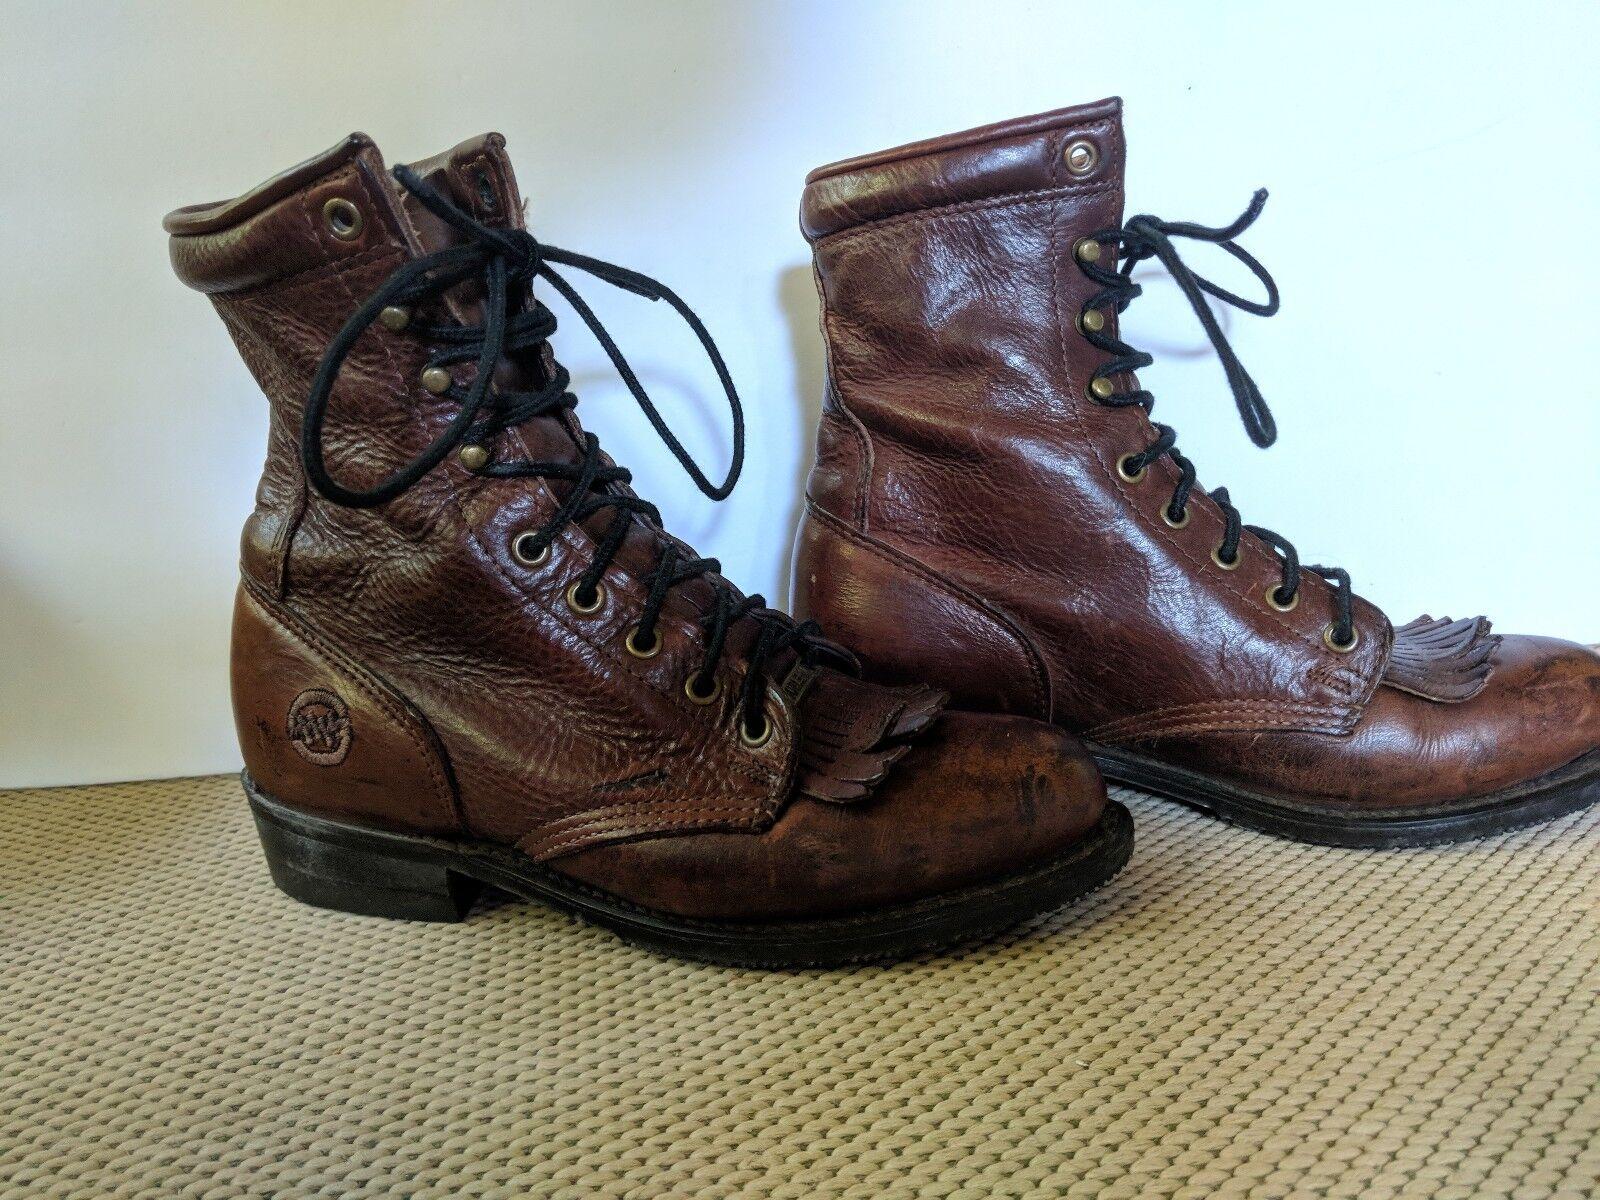 damen Double H Logger Western Cowboy Granny Stiefel Größe 7.5W 7.5W 7.5W Leather 48a933